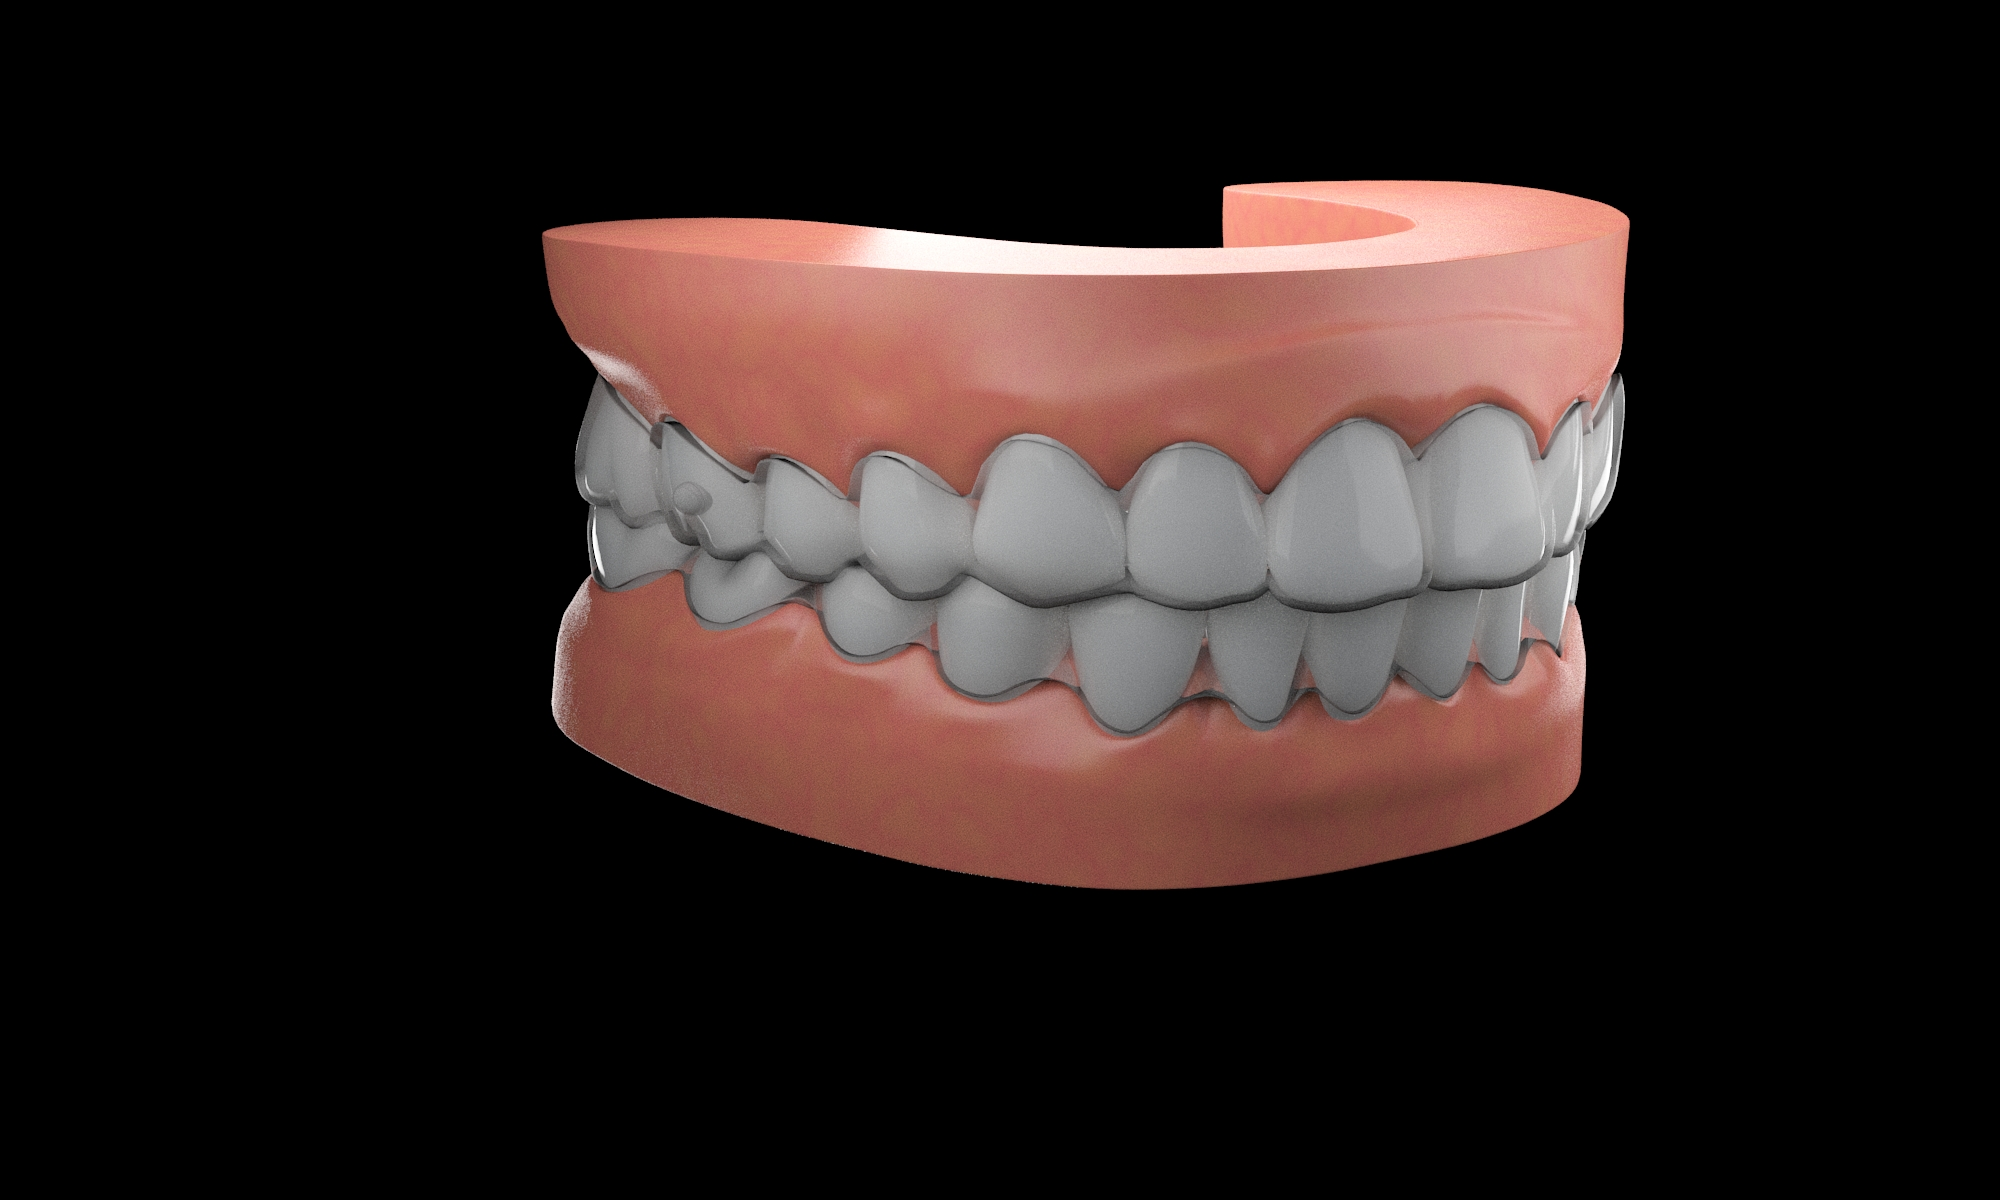 Simulation Denture Adult Teeth 3d Model 3D Model